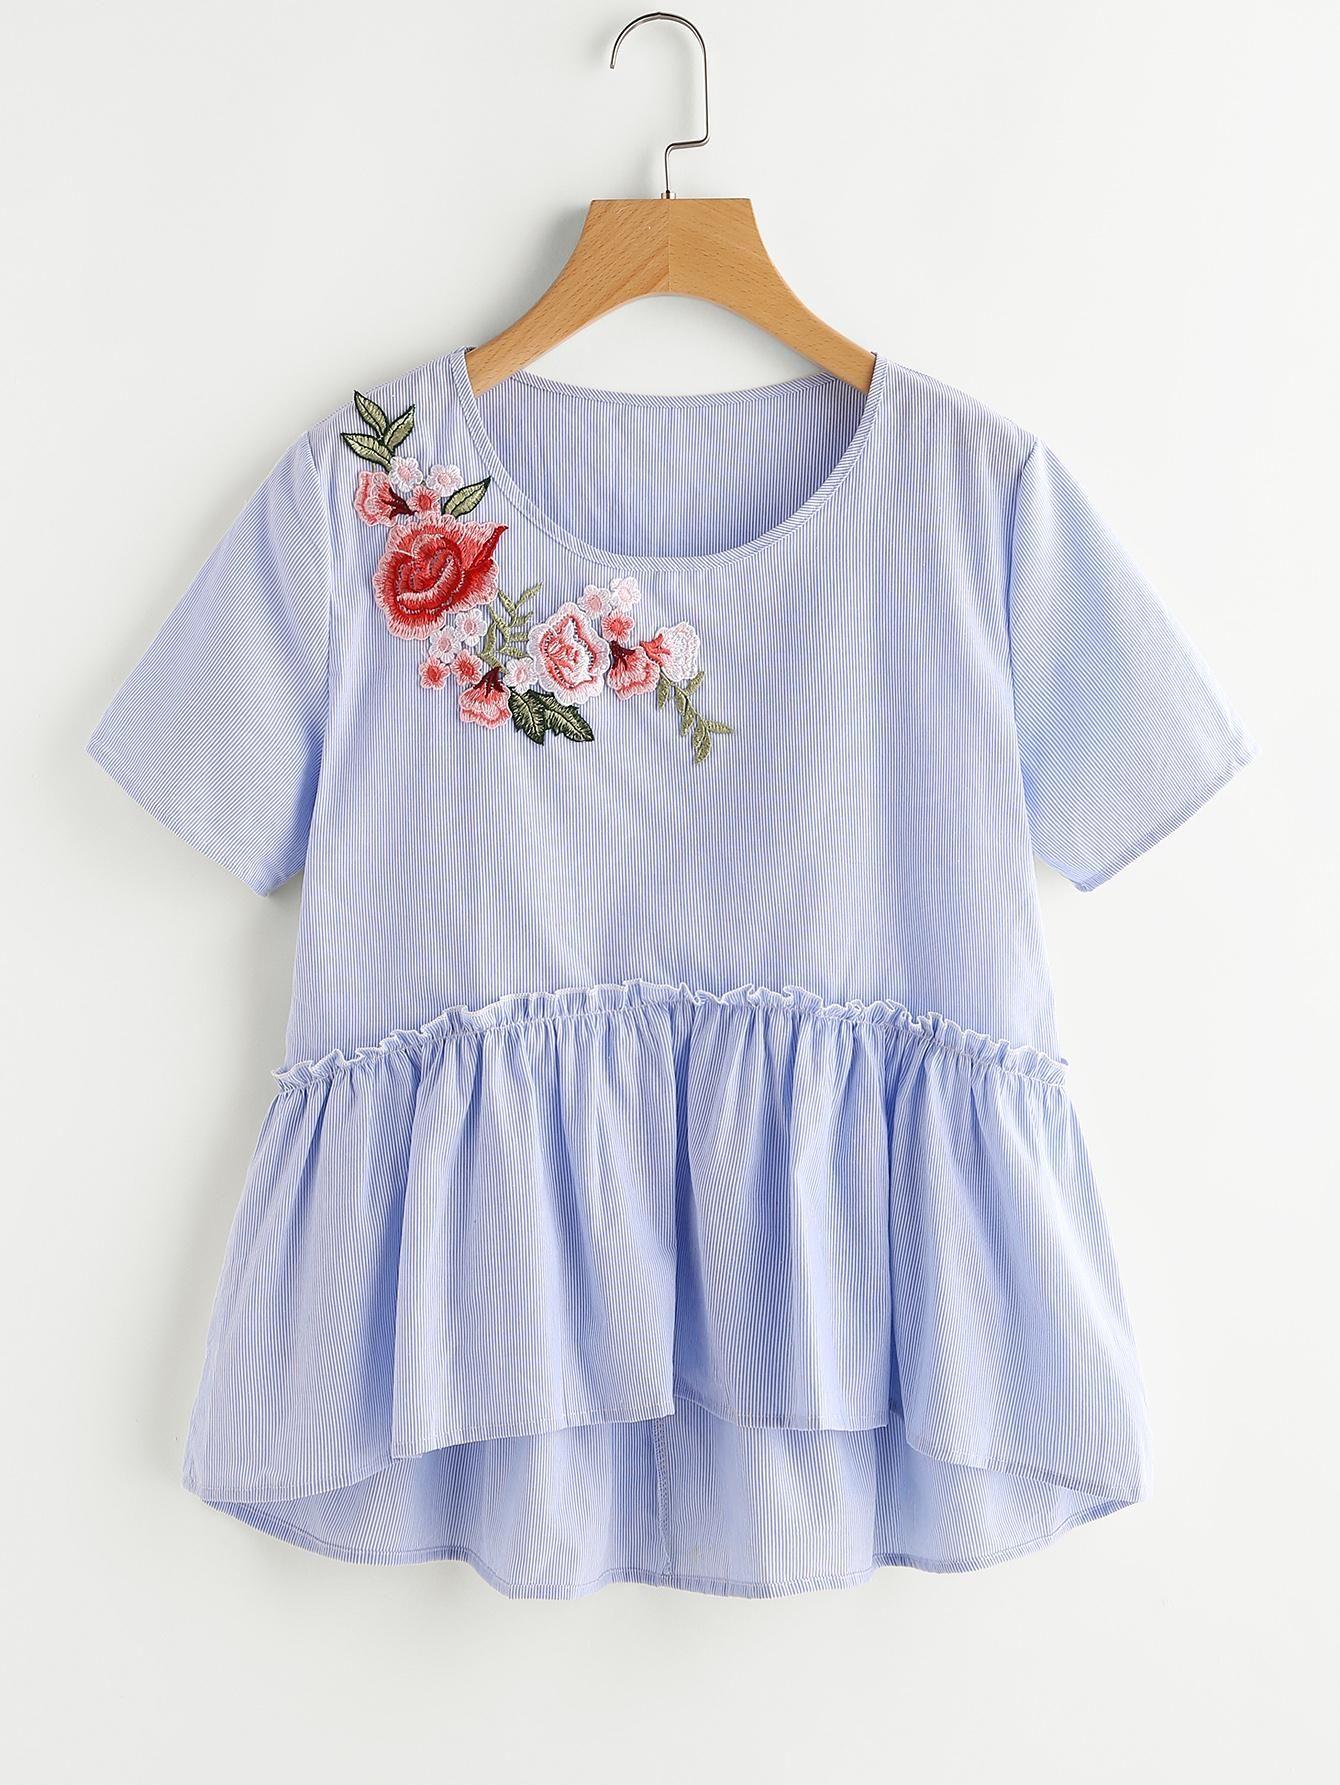 3edc3acffa102 SheIn - SheIn Applique Smock Top - AdoreWe.com | Cute Tops | Fashion ...